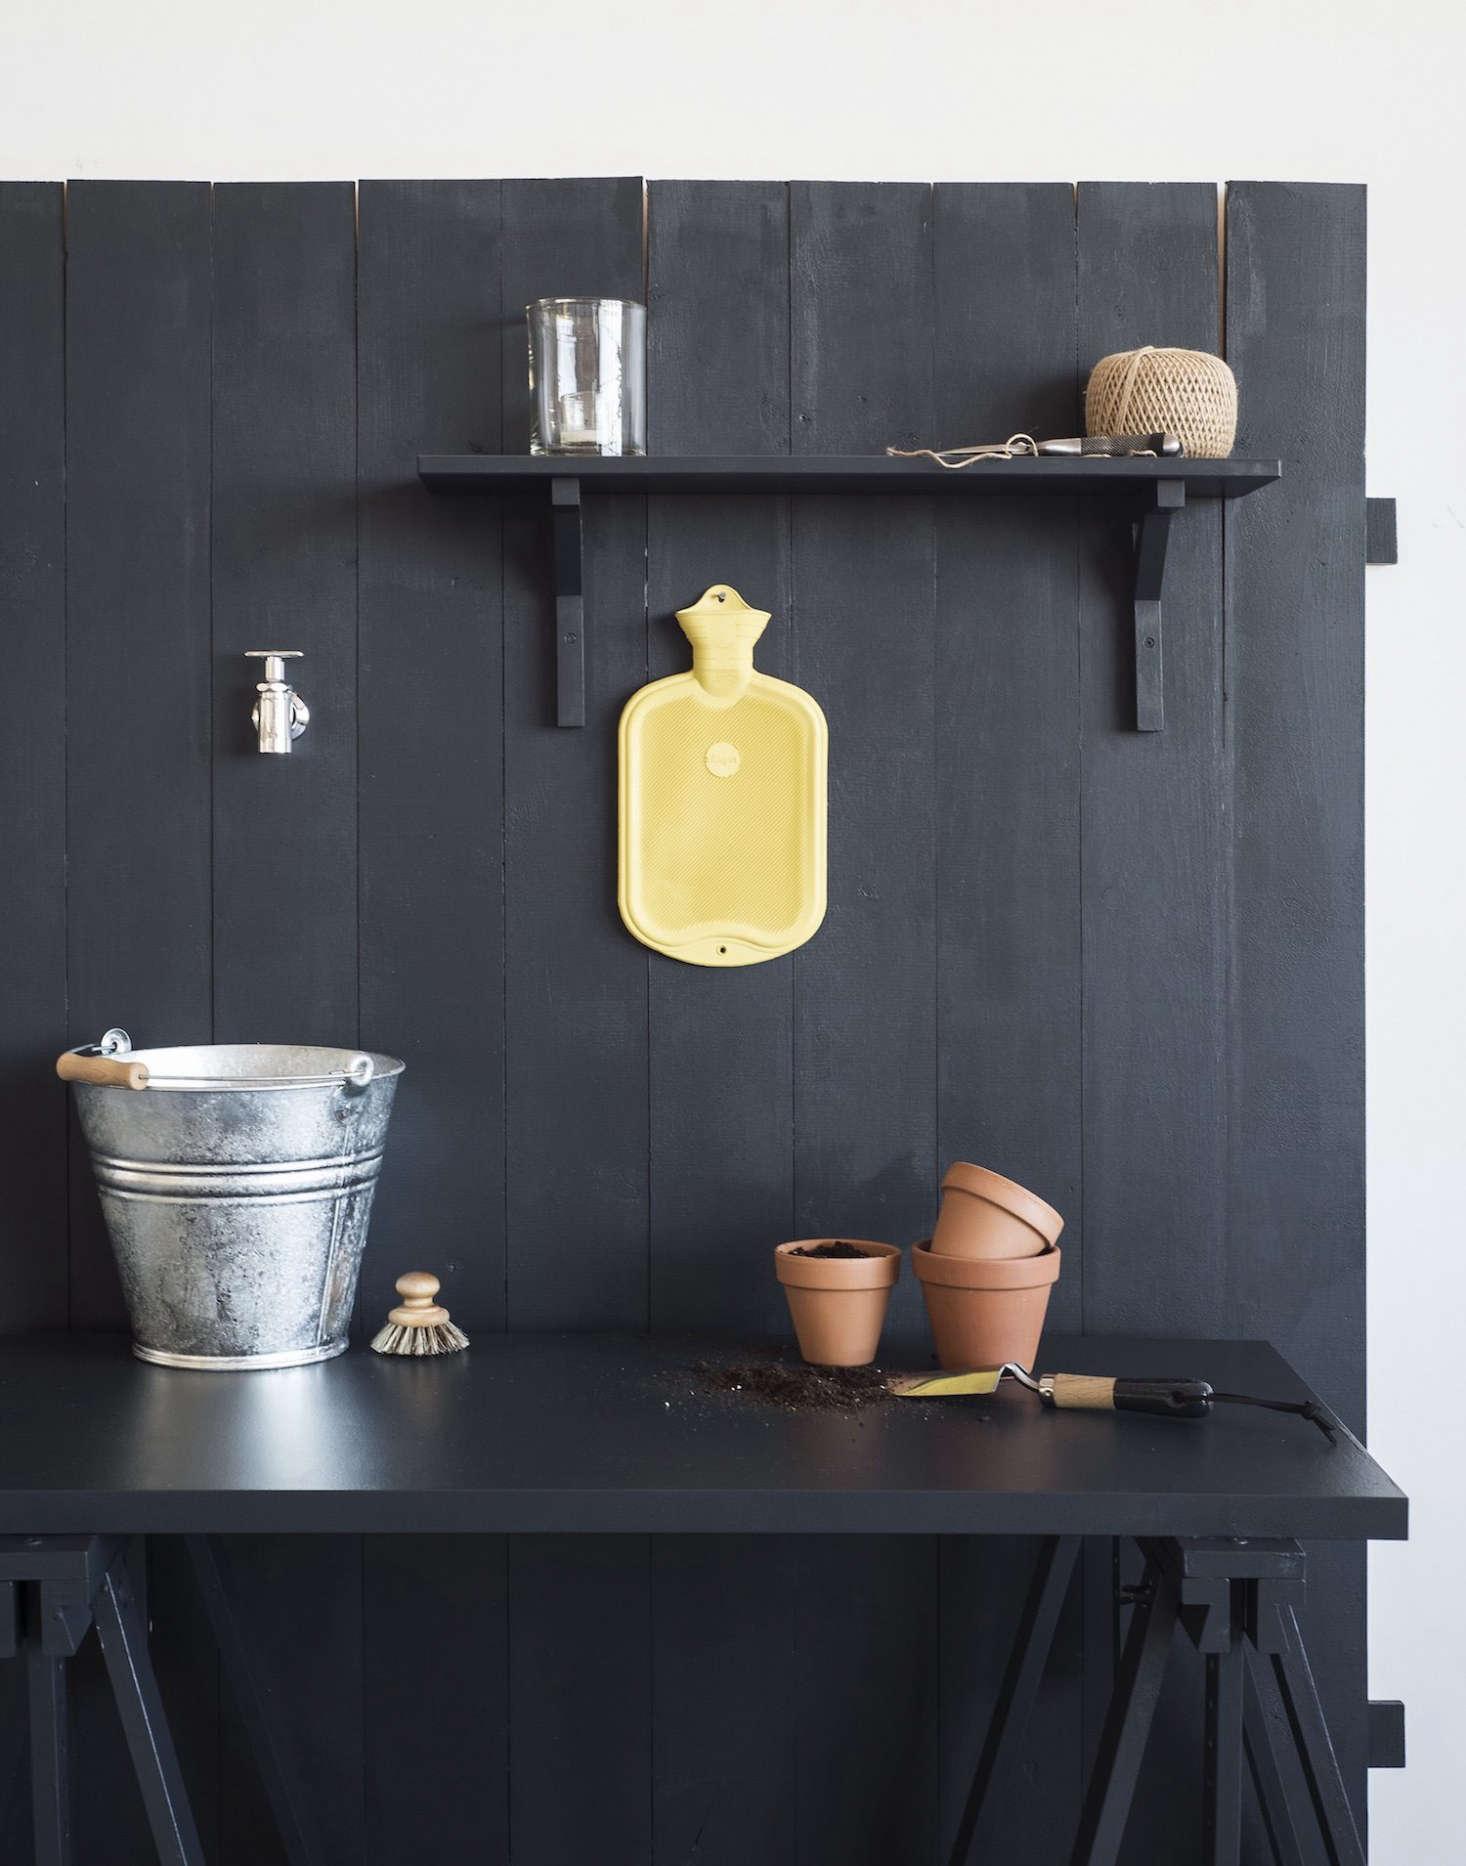 DIY: A Simple Outdoor Sink - Gardenista